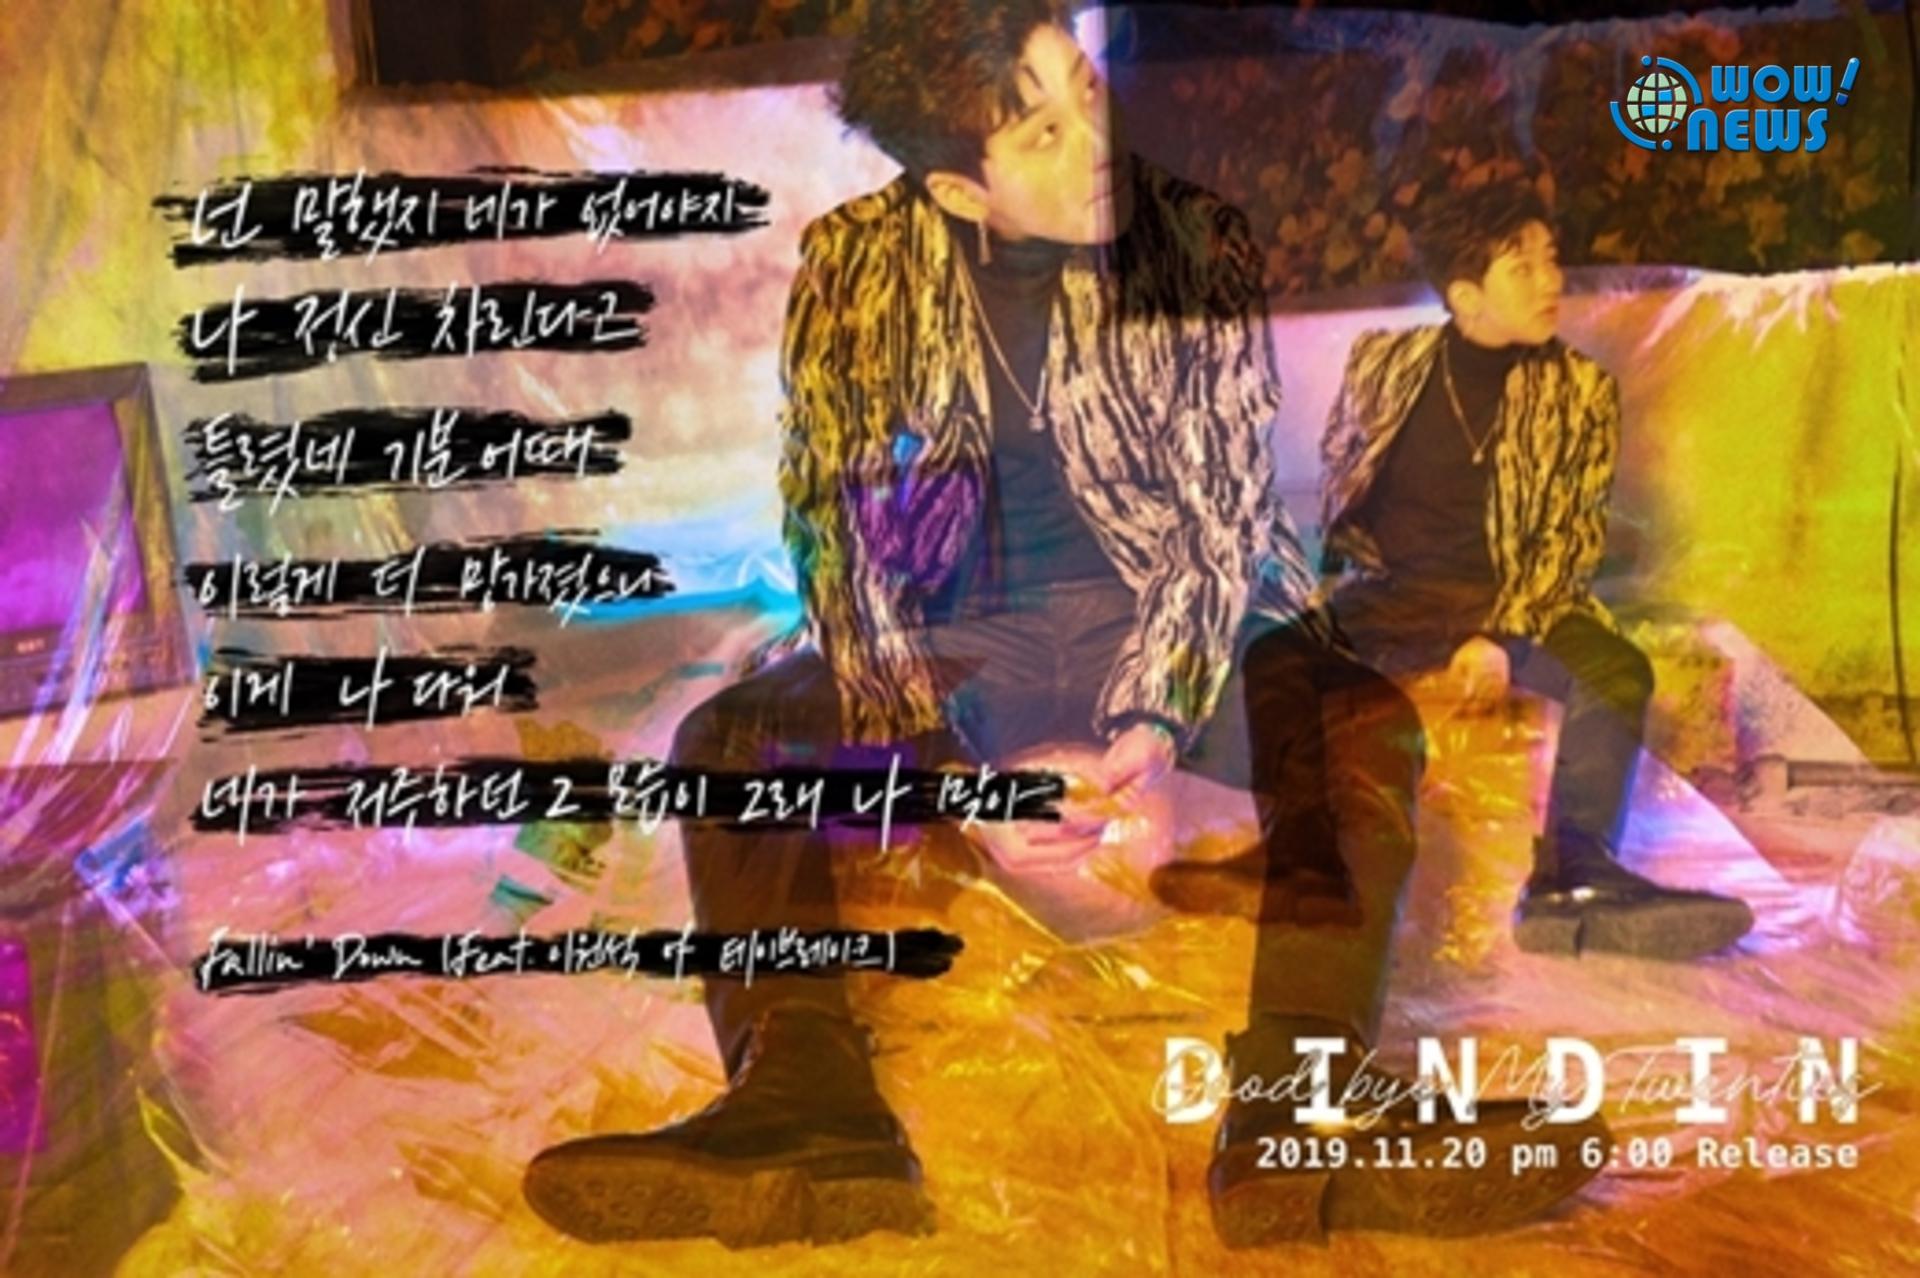 DinDin公開首張正規專輯 主打曲「Fallin' Down」部分歌詞